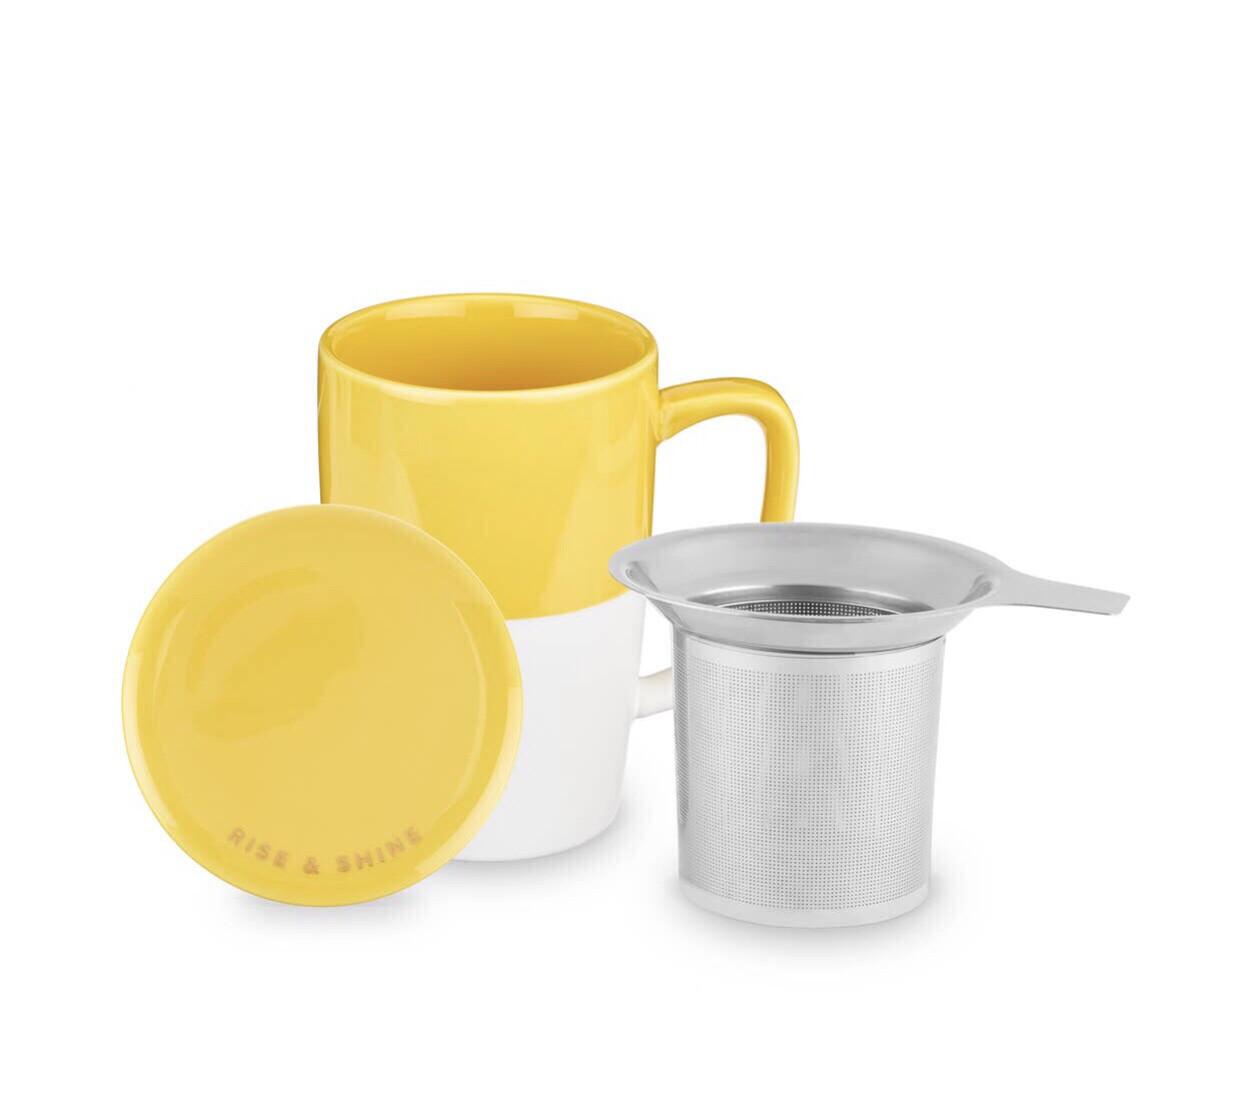 Delia Infuser Tea Mug Set